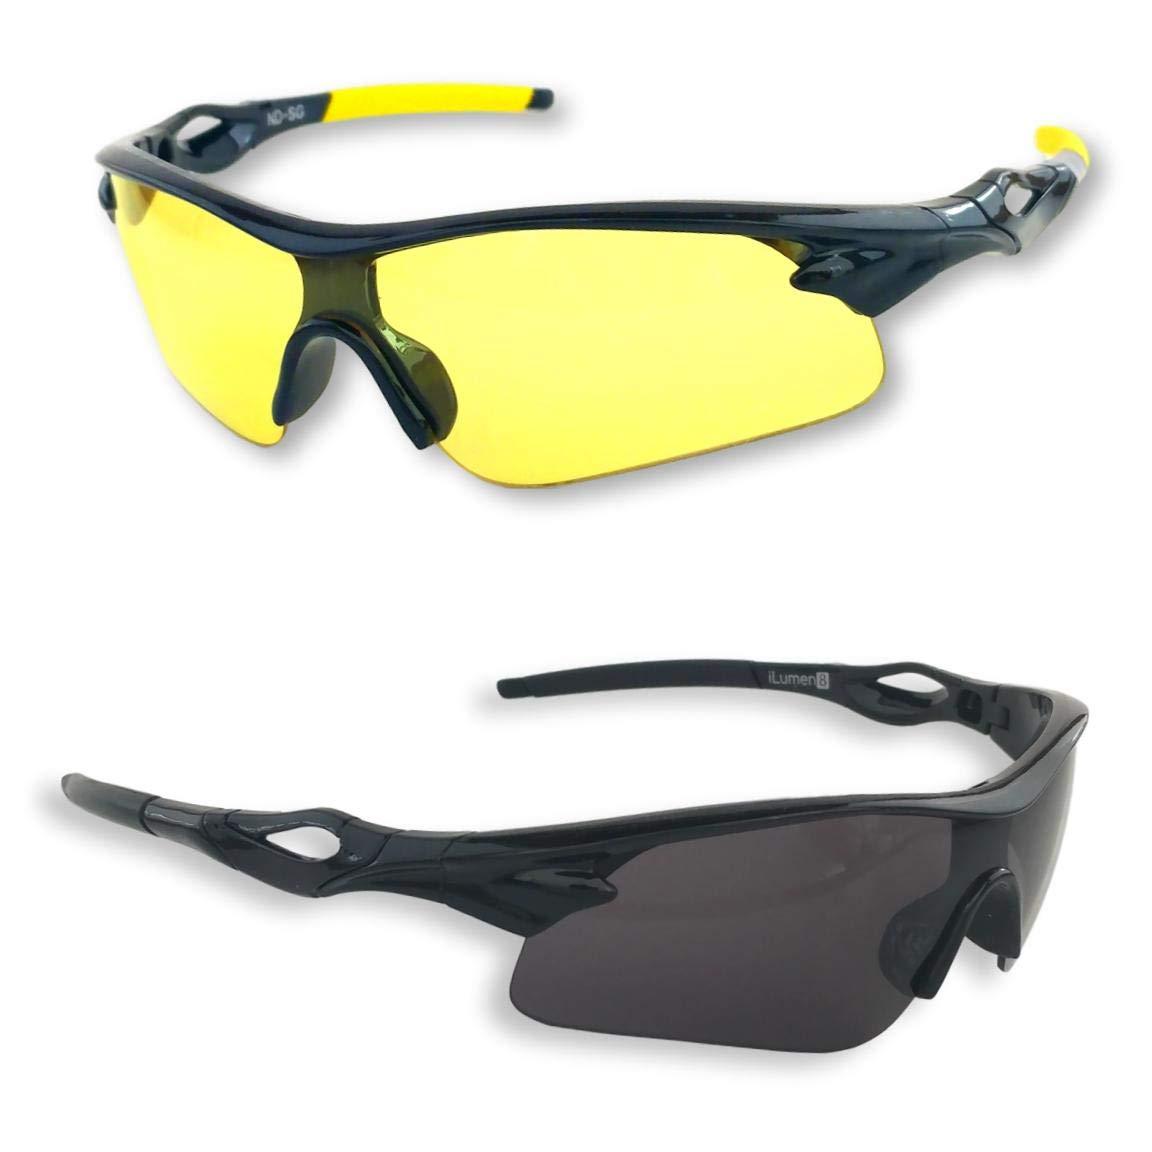 iLumen8 Best Shooting Glasses UV Blacklight Flashlight Yellow Safety Eye Protection See Dog Cat Urine with Amber Black Lights Night Vision Ultraviolet (Yellow & Black, 2 Pair)